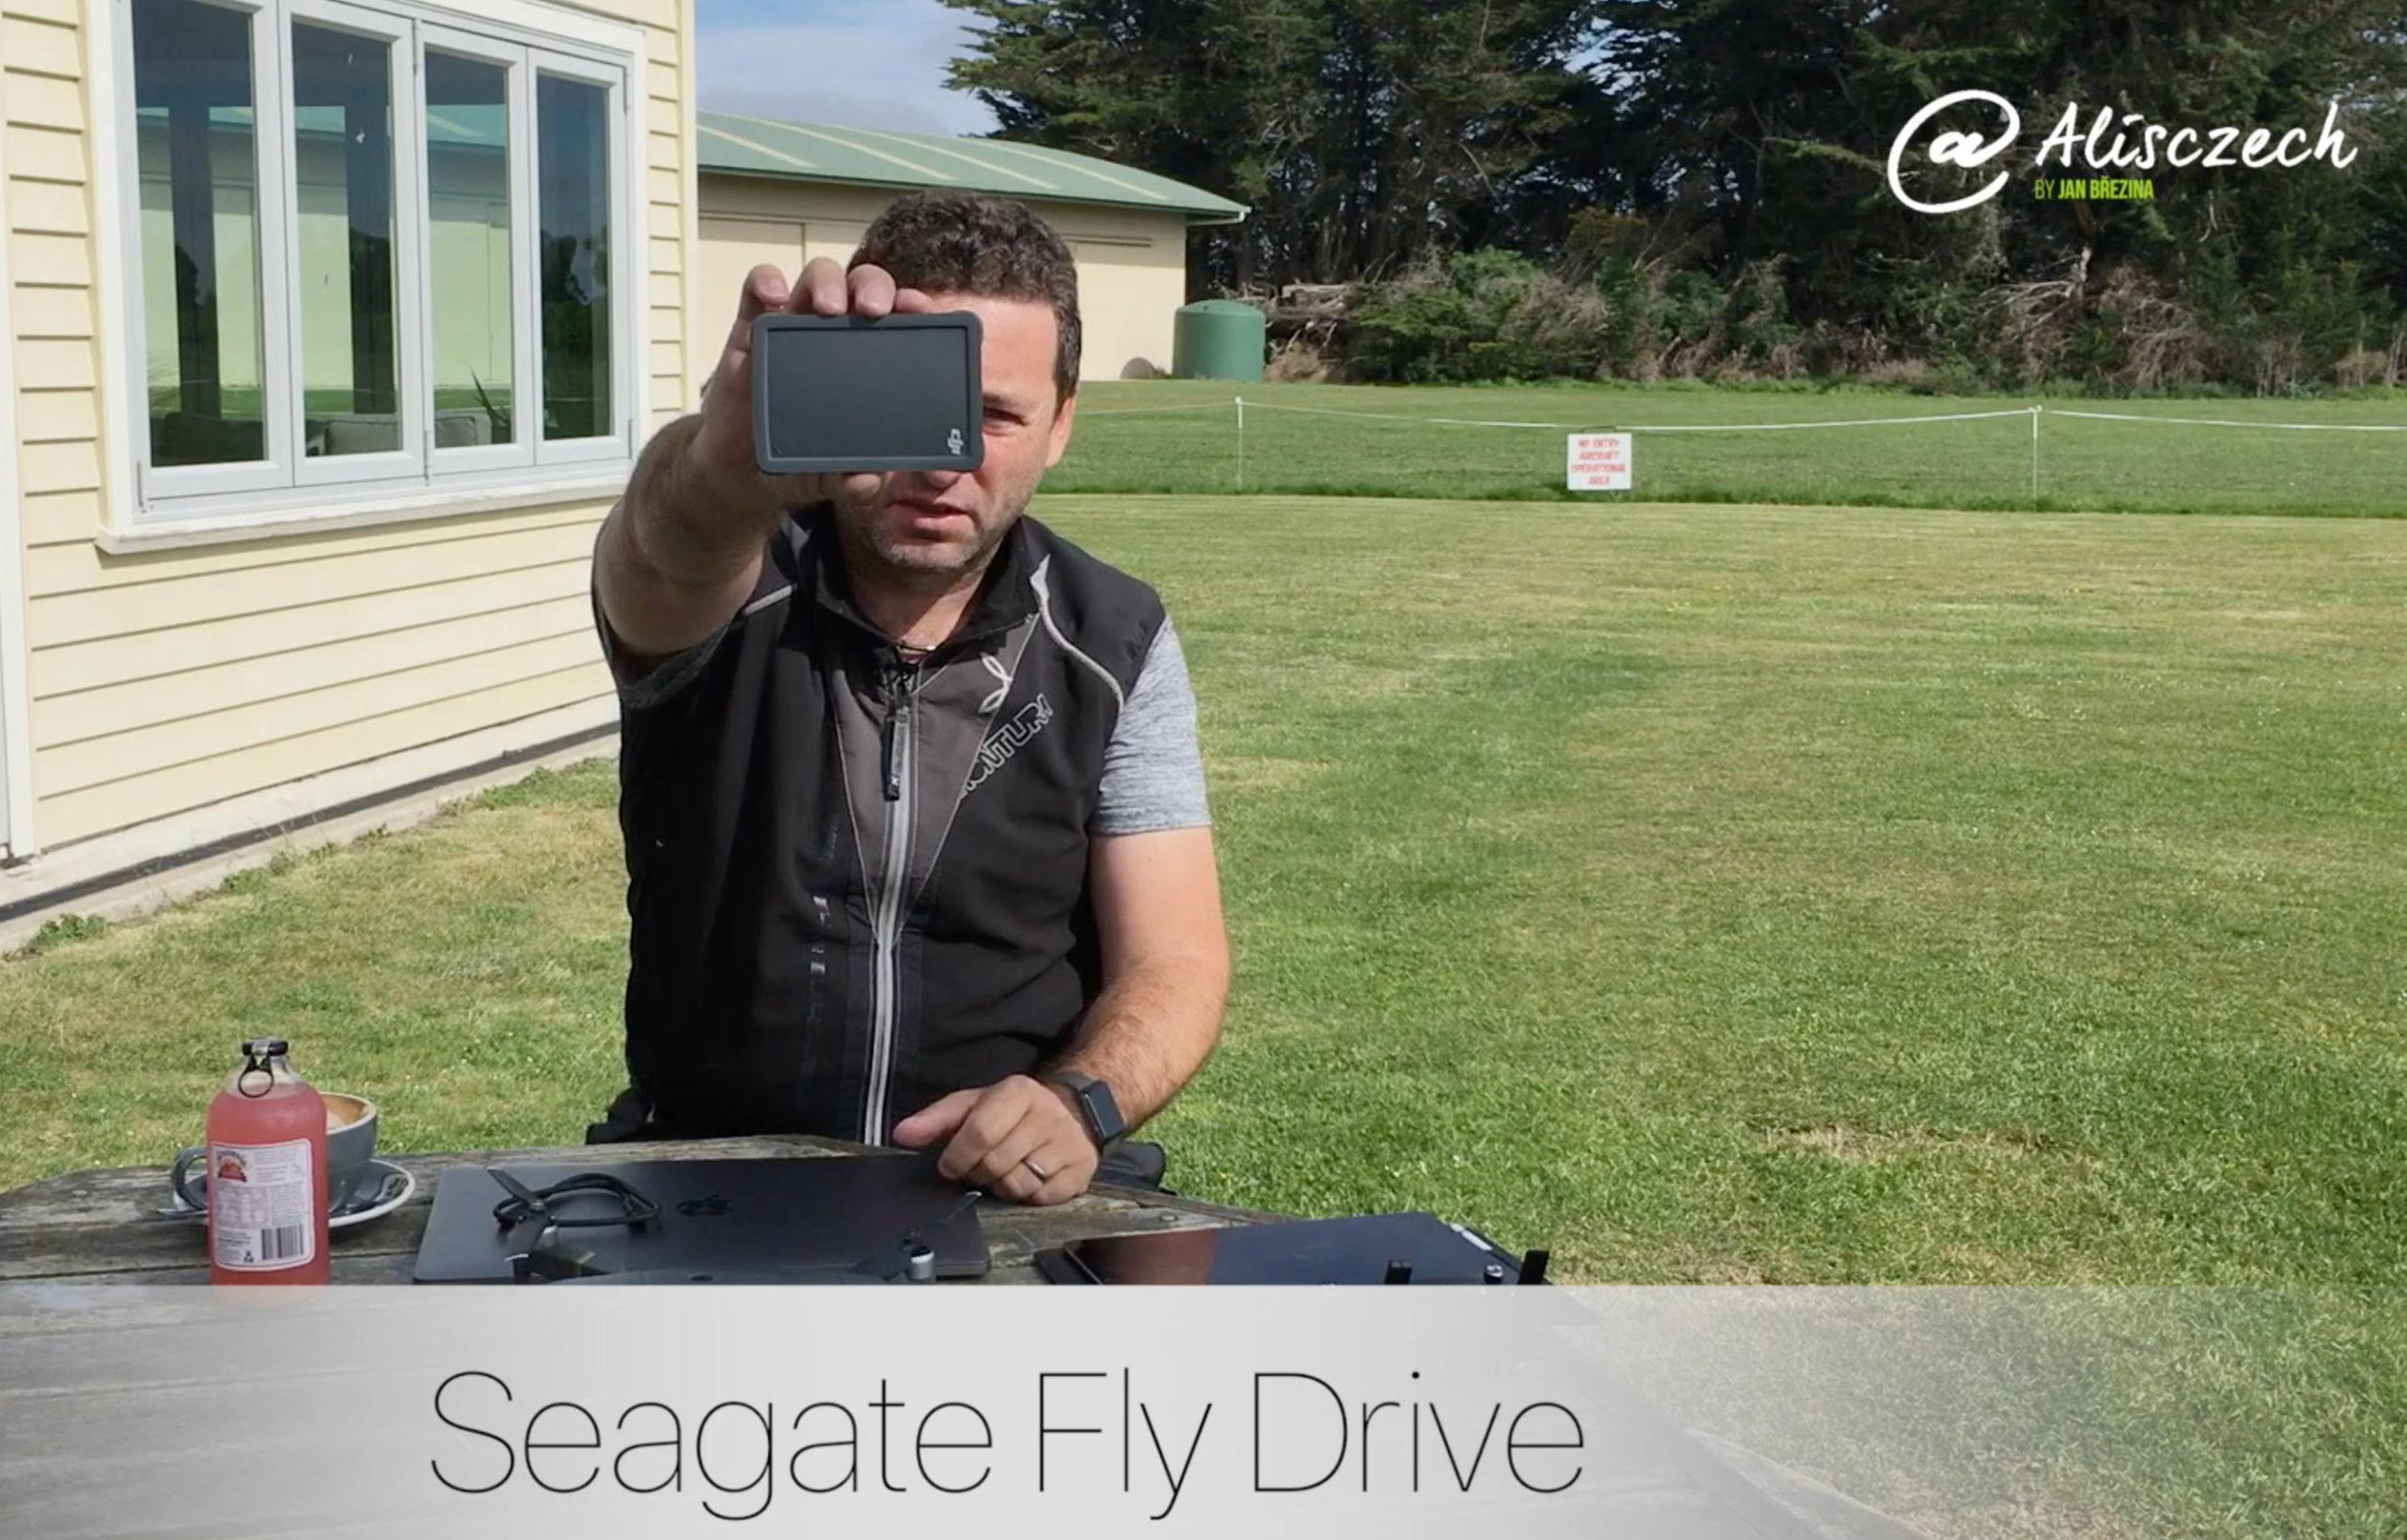 Seagate DJI Fly Drive v praxi (Alisczech vol. 30)